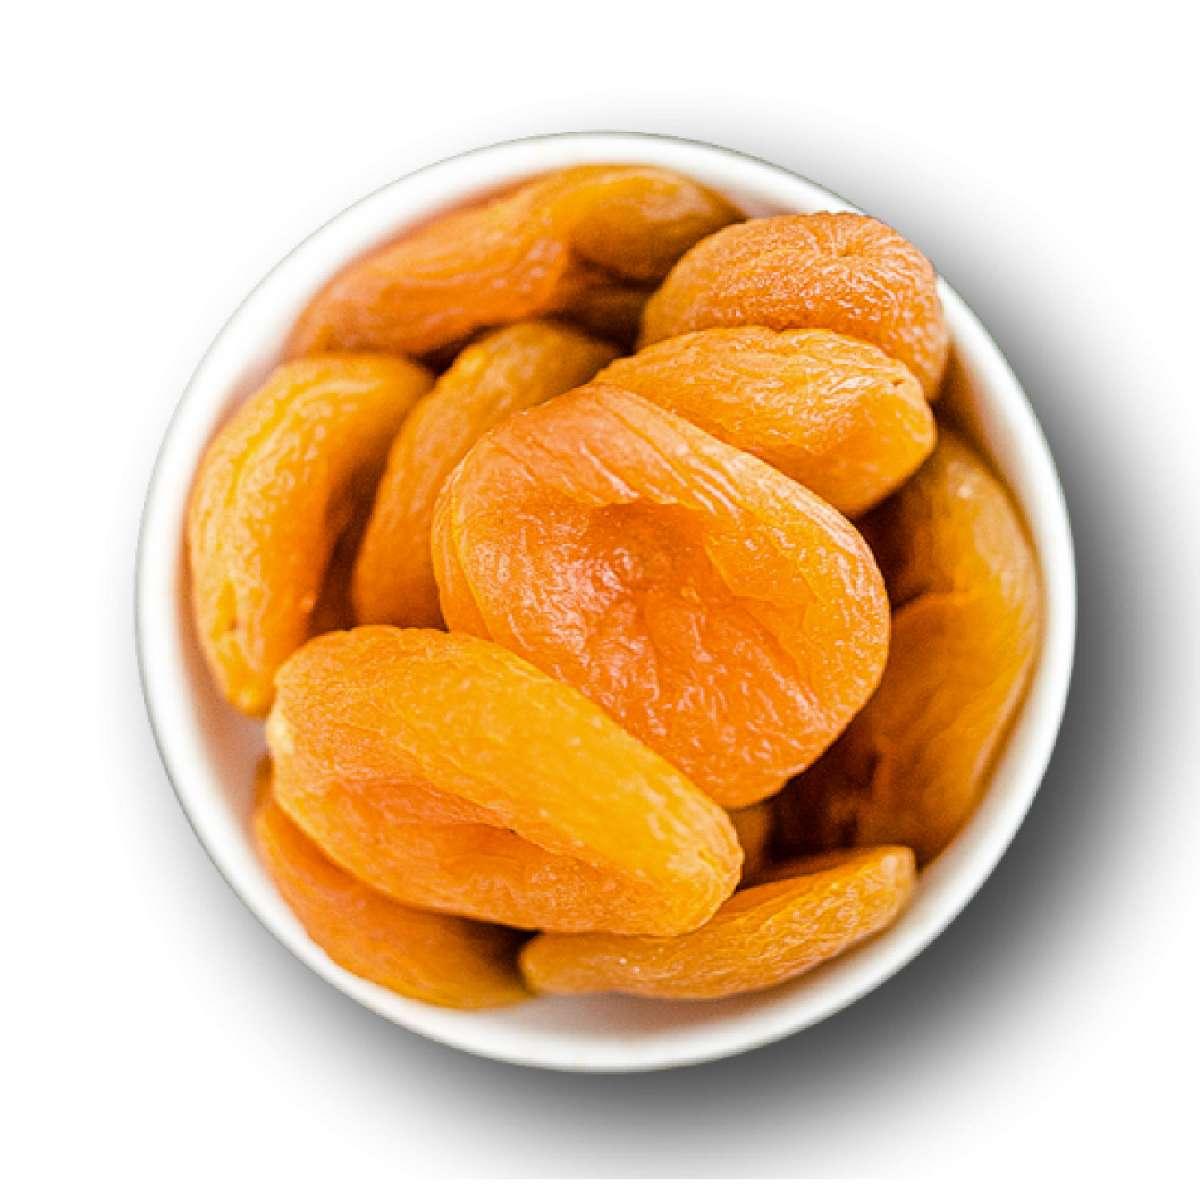 Getrocknete Aprikosen geschwefelt | Trockenfrüchte